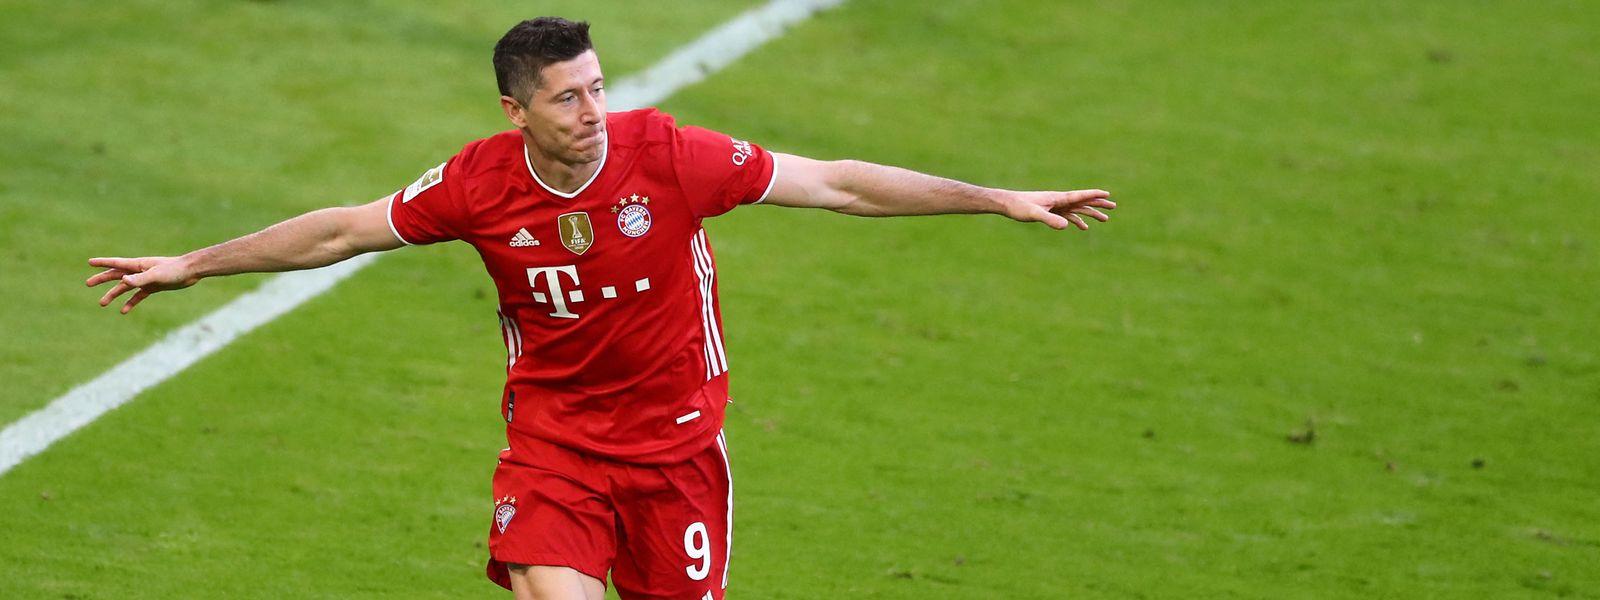 Bayern-Stürmer Robert Lewandowski is auf bestem Wege zum Bundesliga-Rekord.